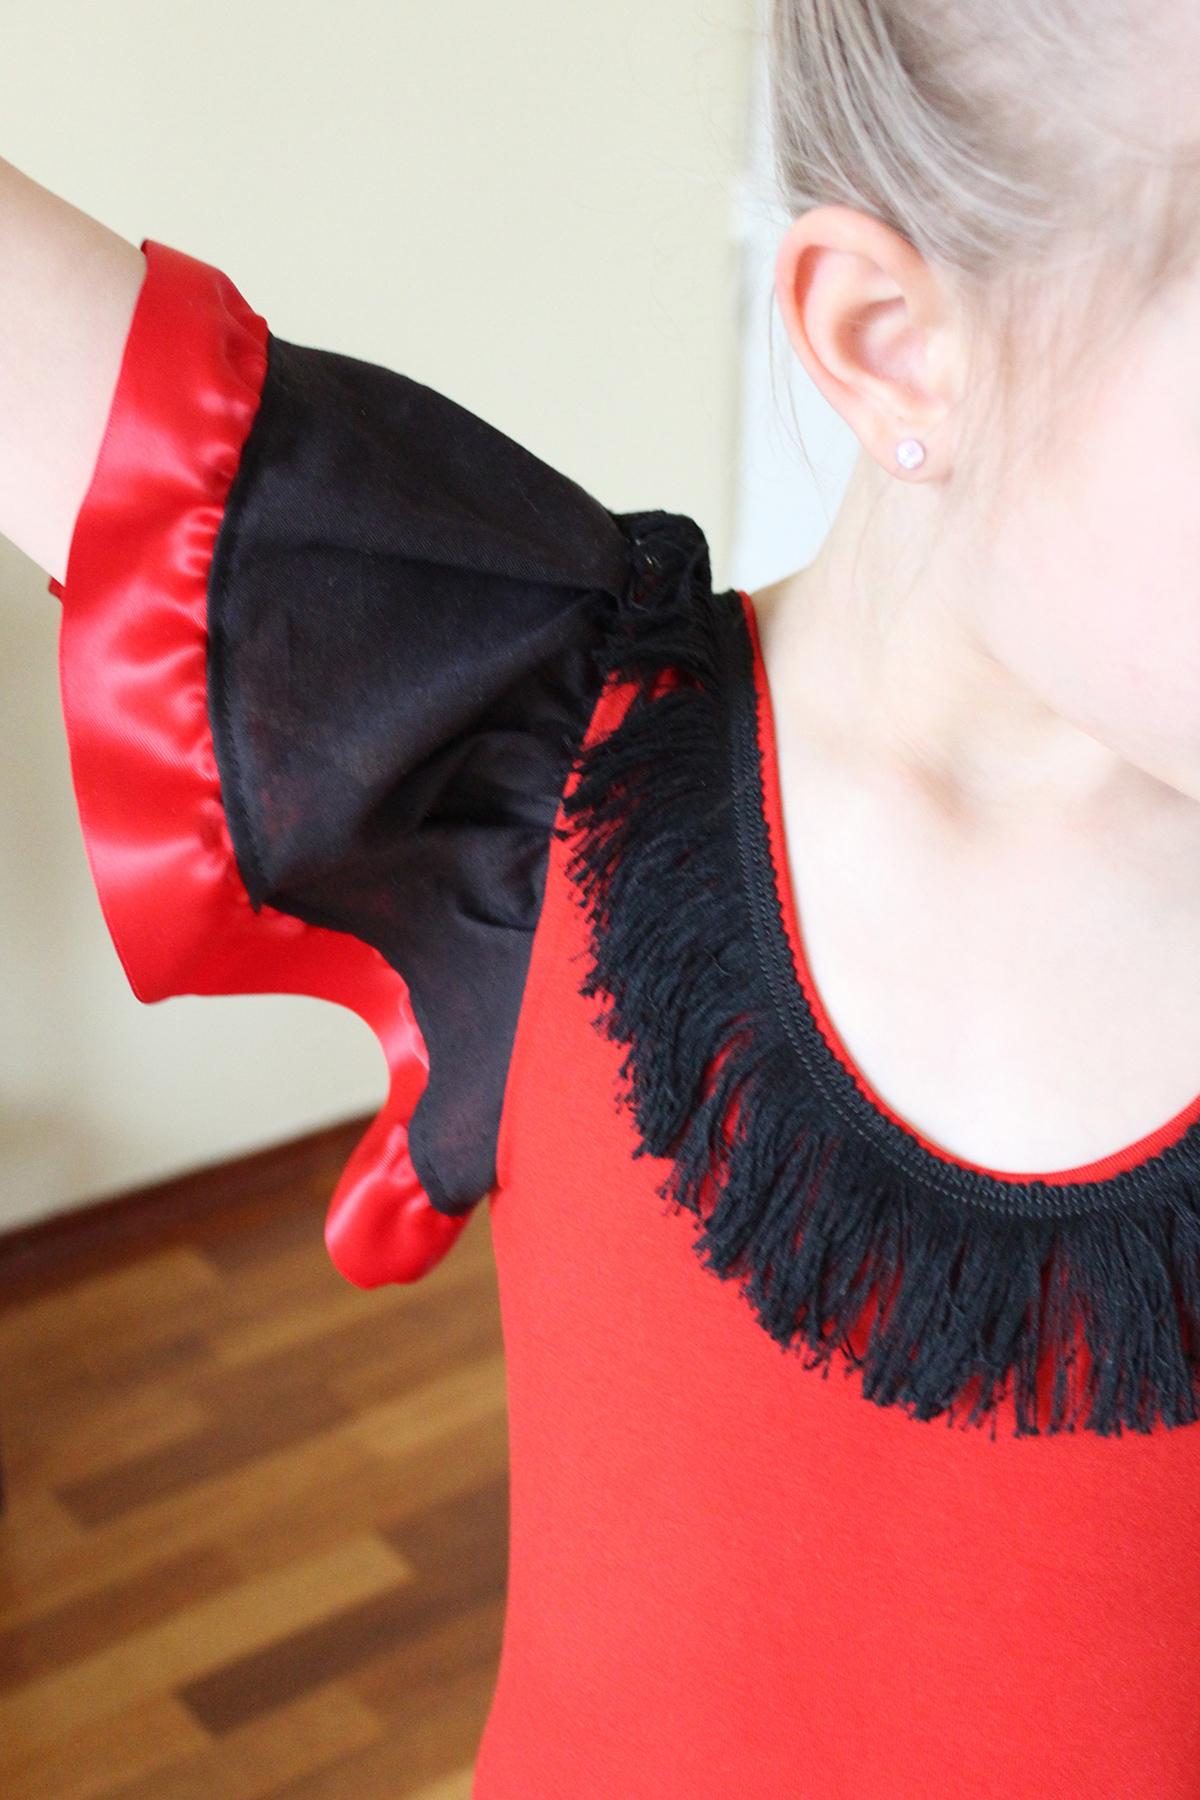 flamencokleid Schnittmuster: Rüschenärmel